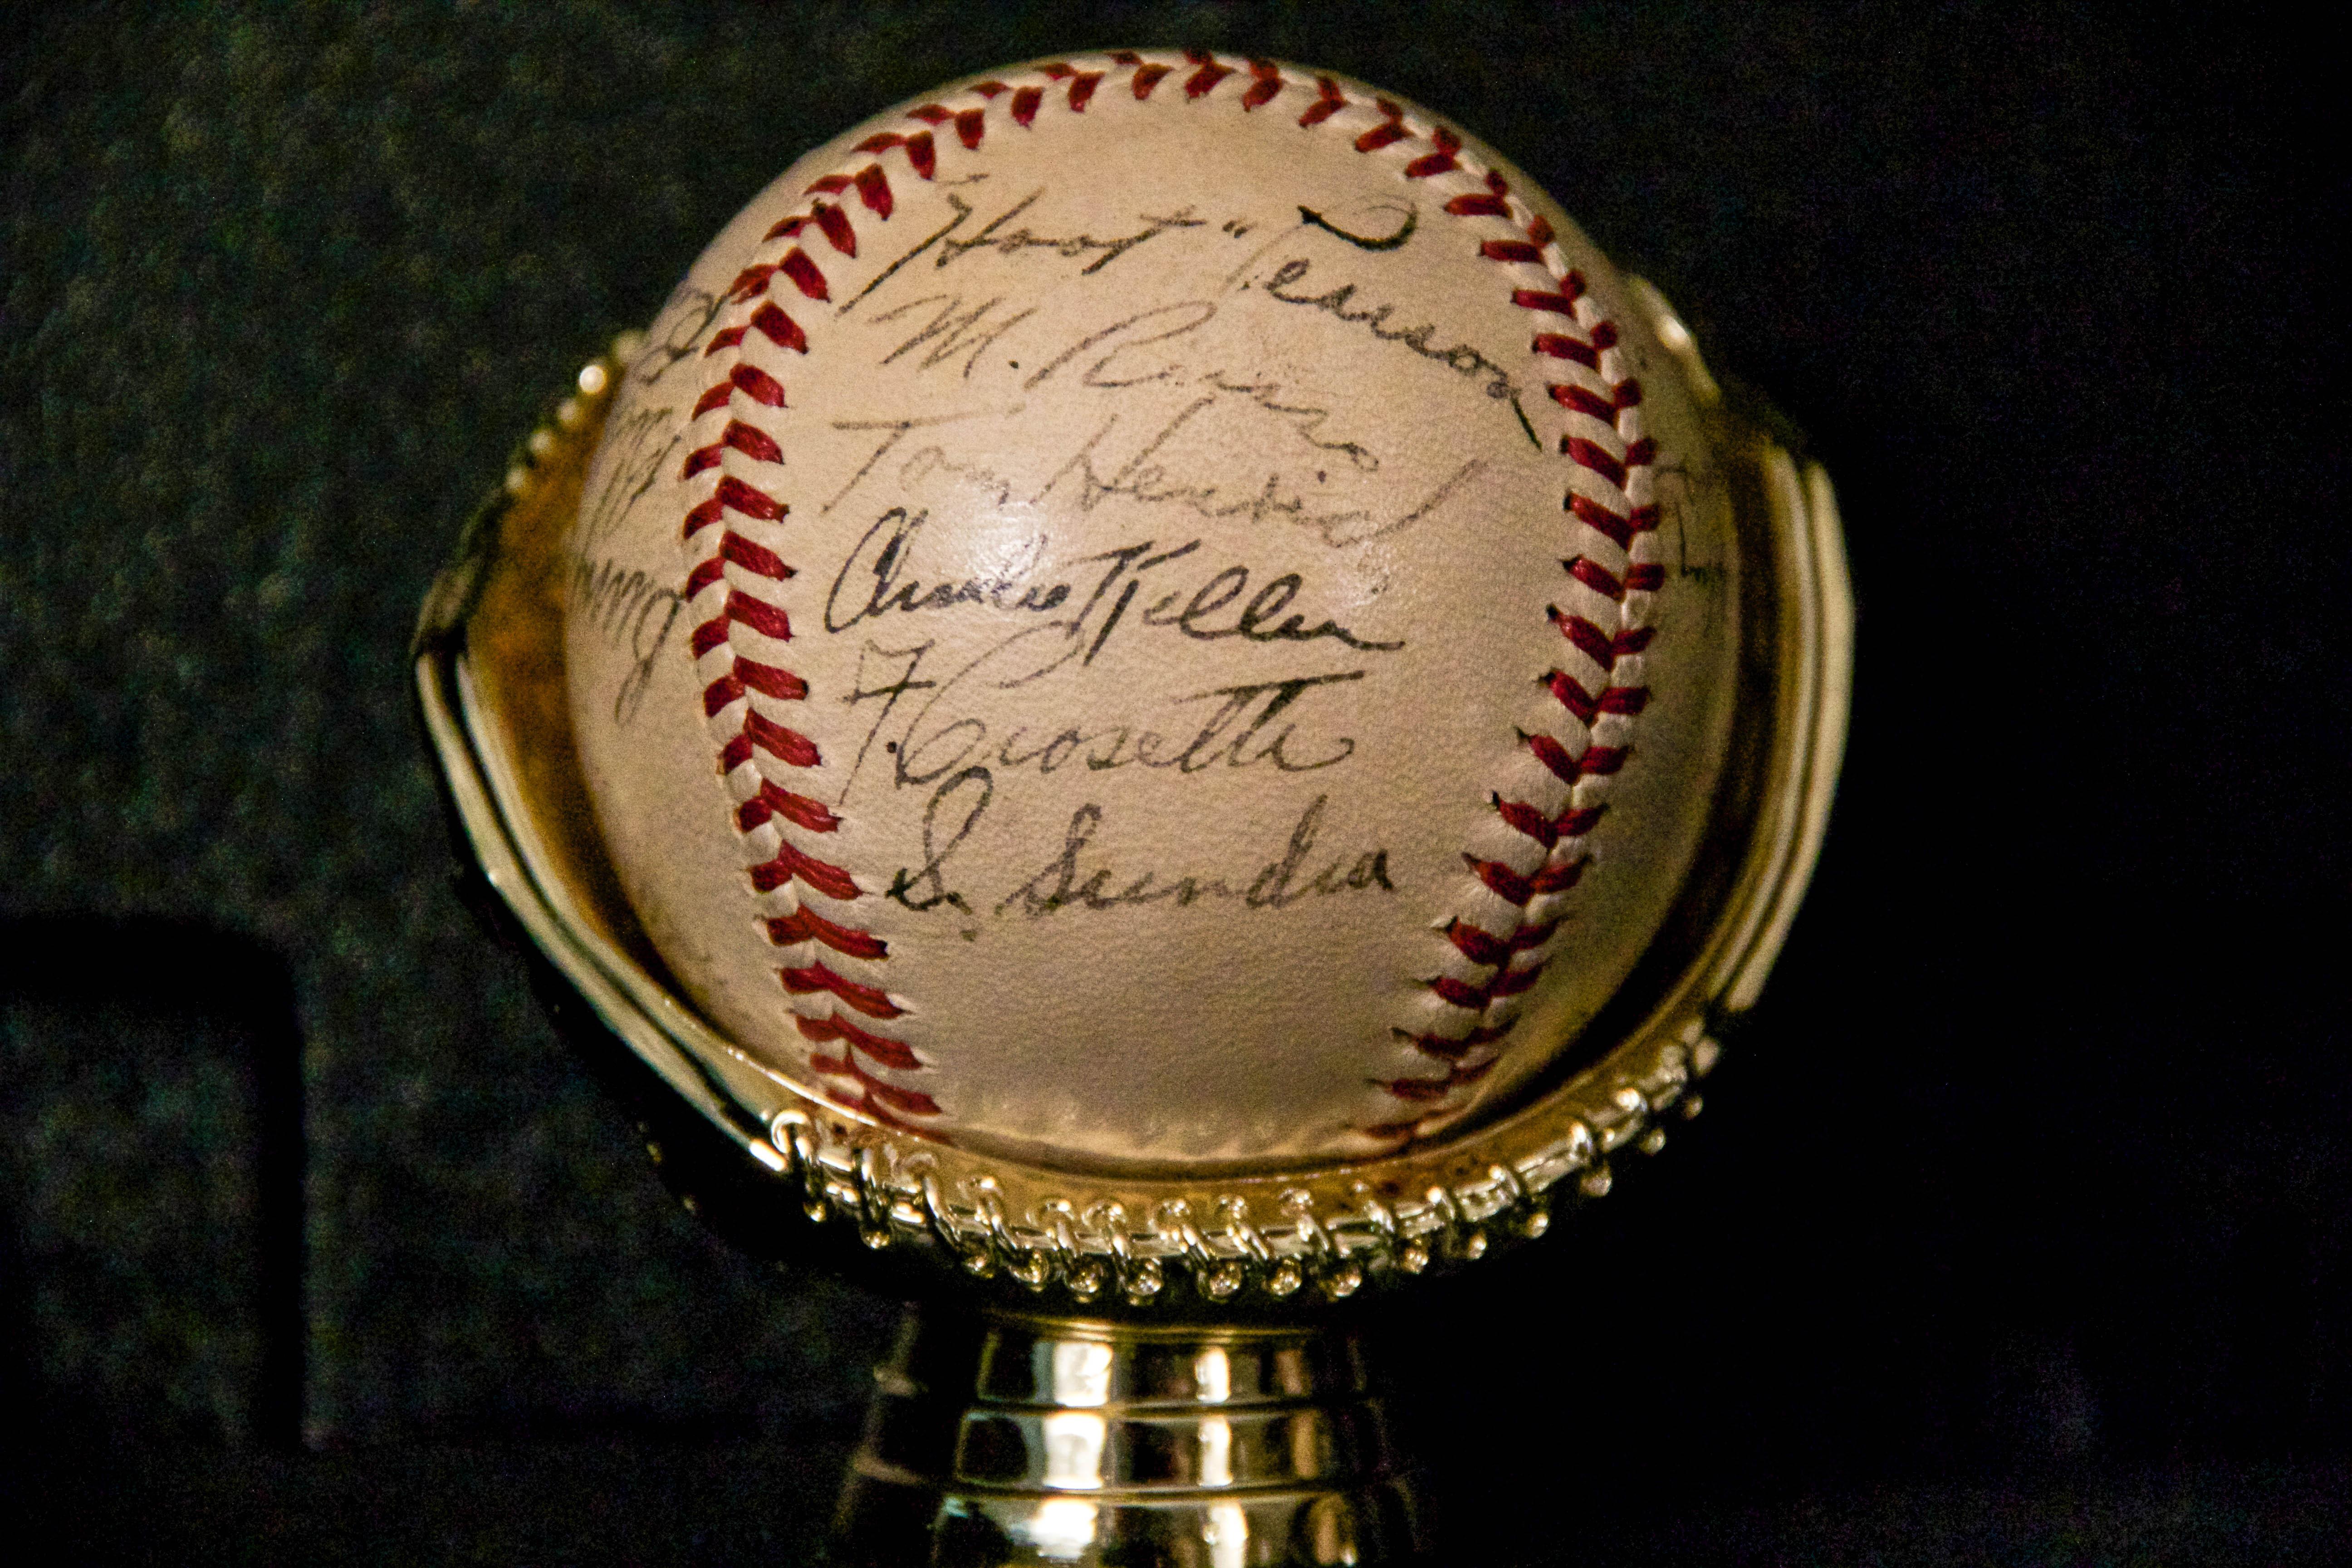 1939 World Series Champions